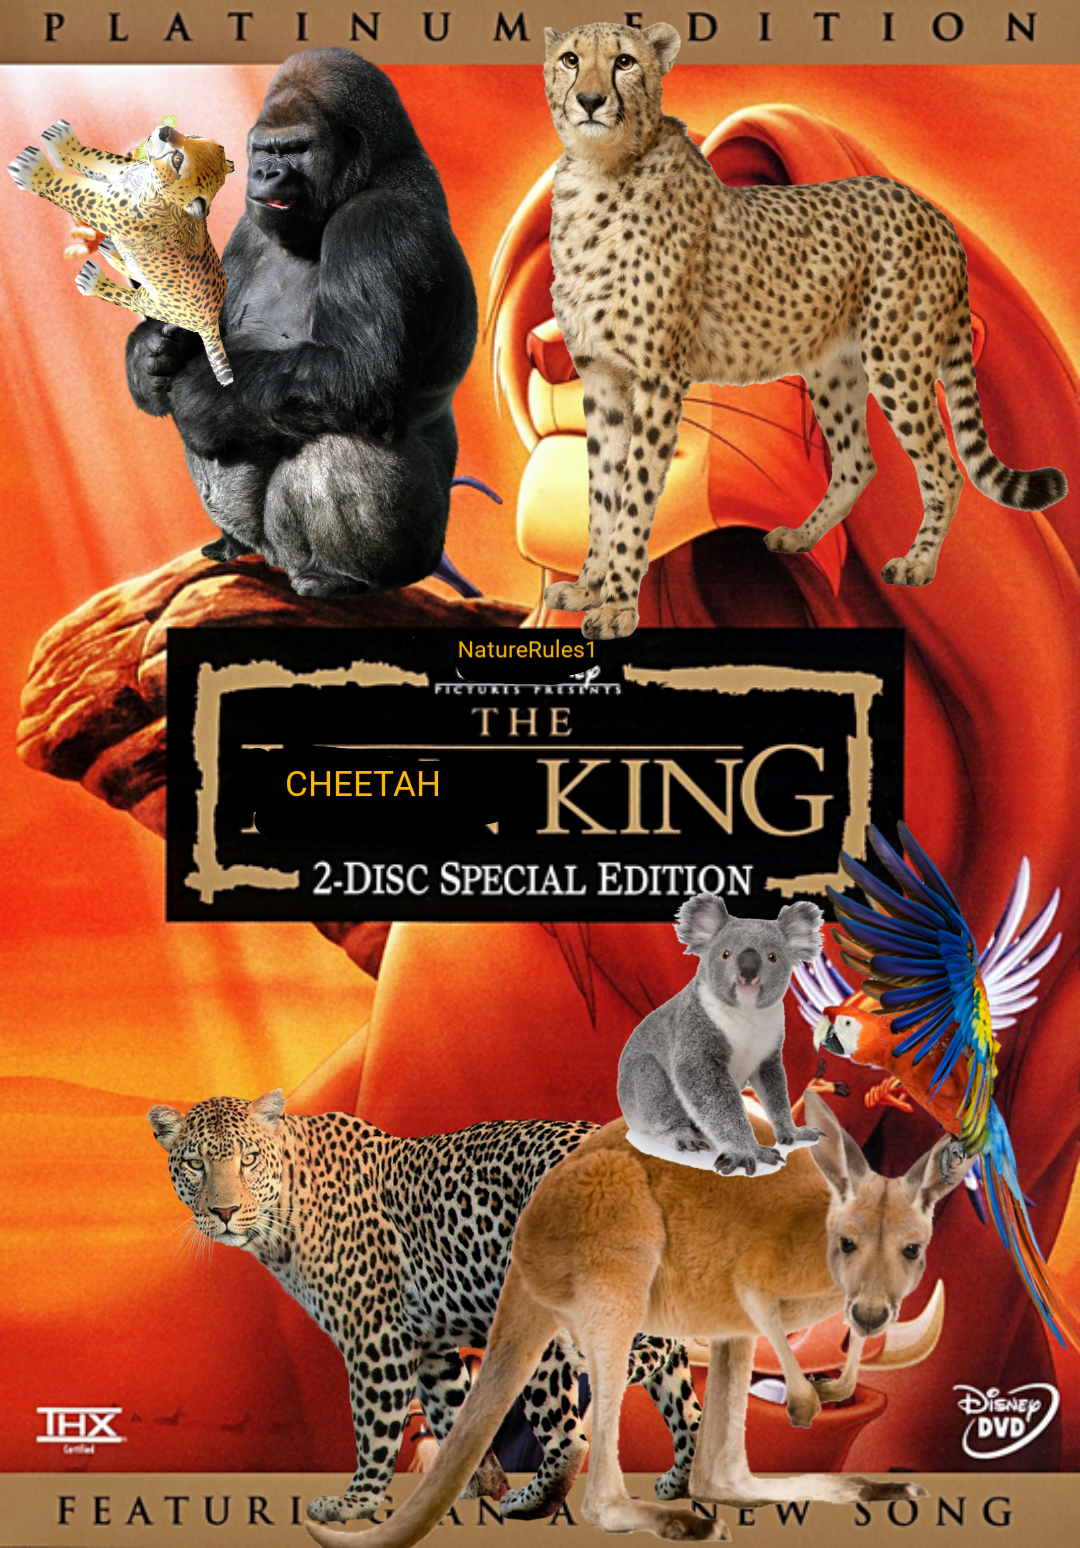 The Cheetah King (NatureRules1 Version)